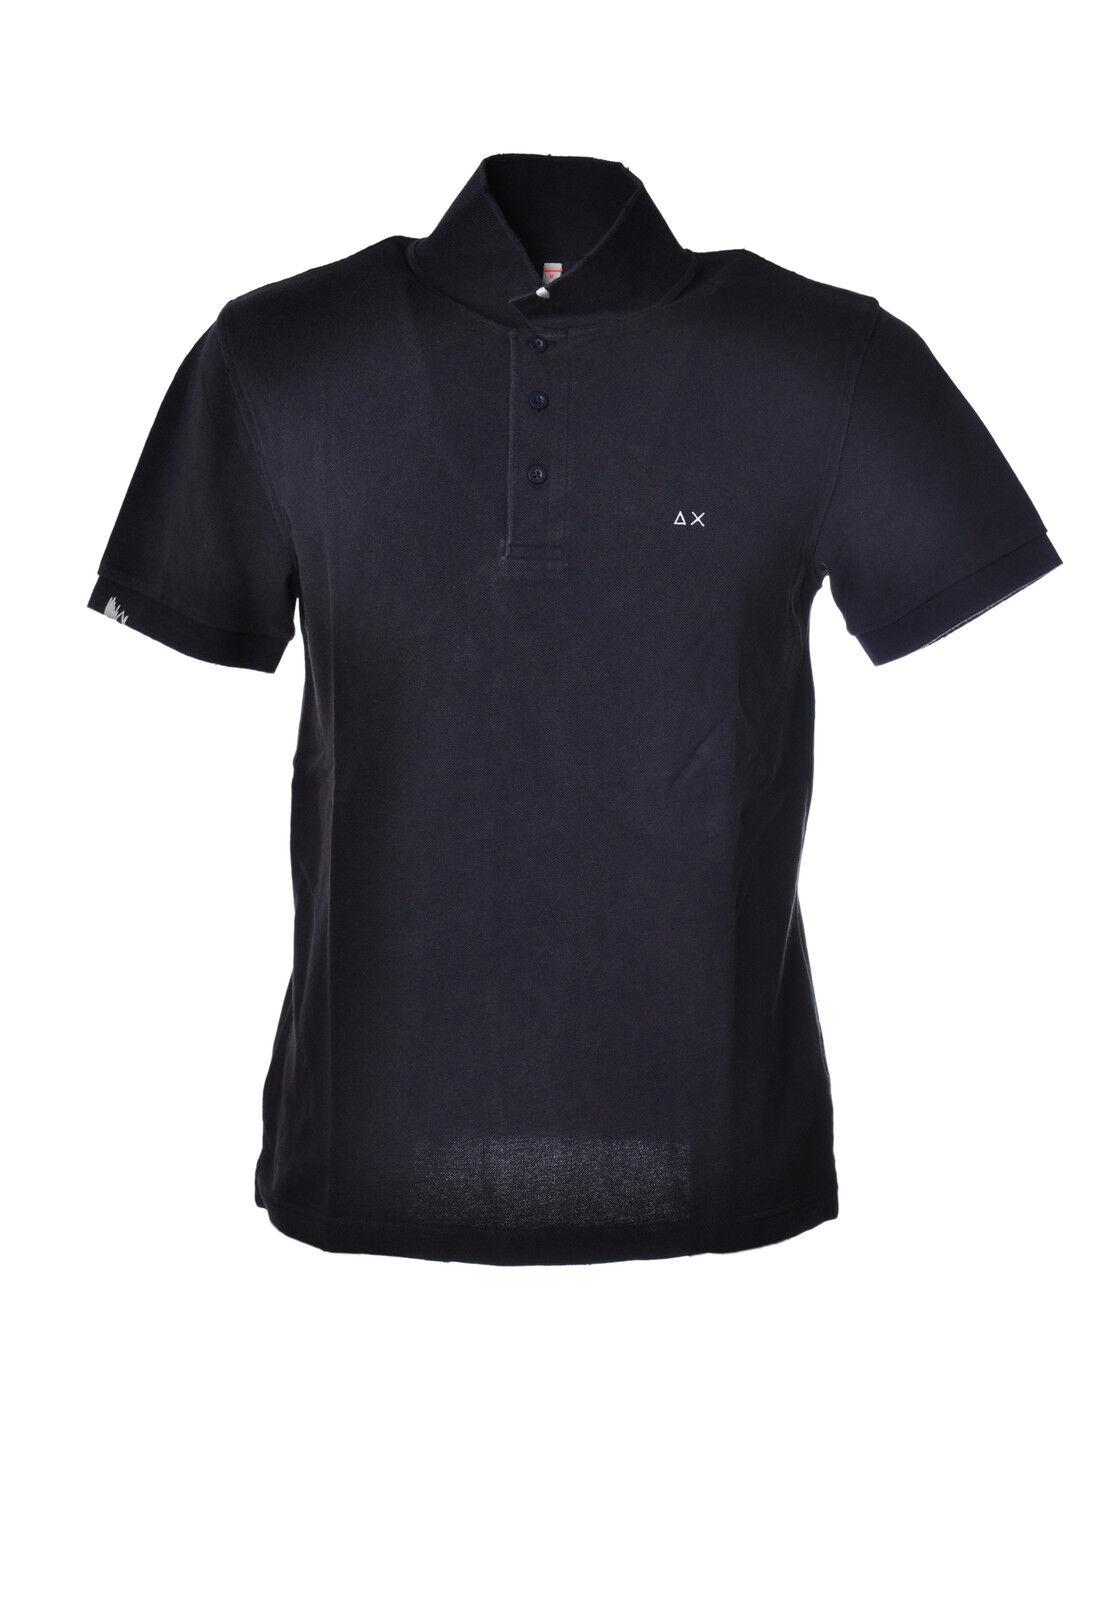 Sun 68 - Topwear-Polo - Man - Blau - 3189131G185421